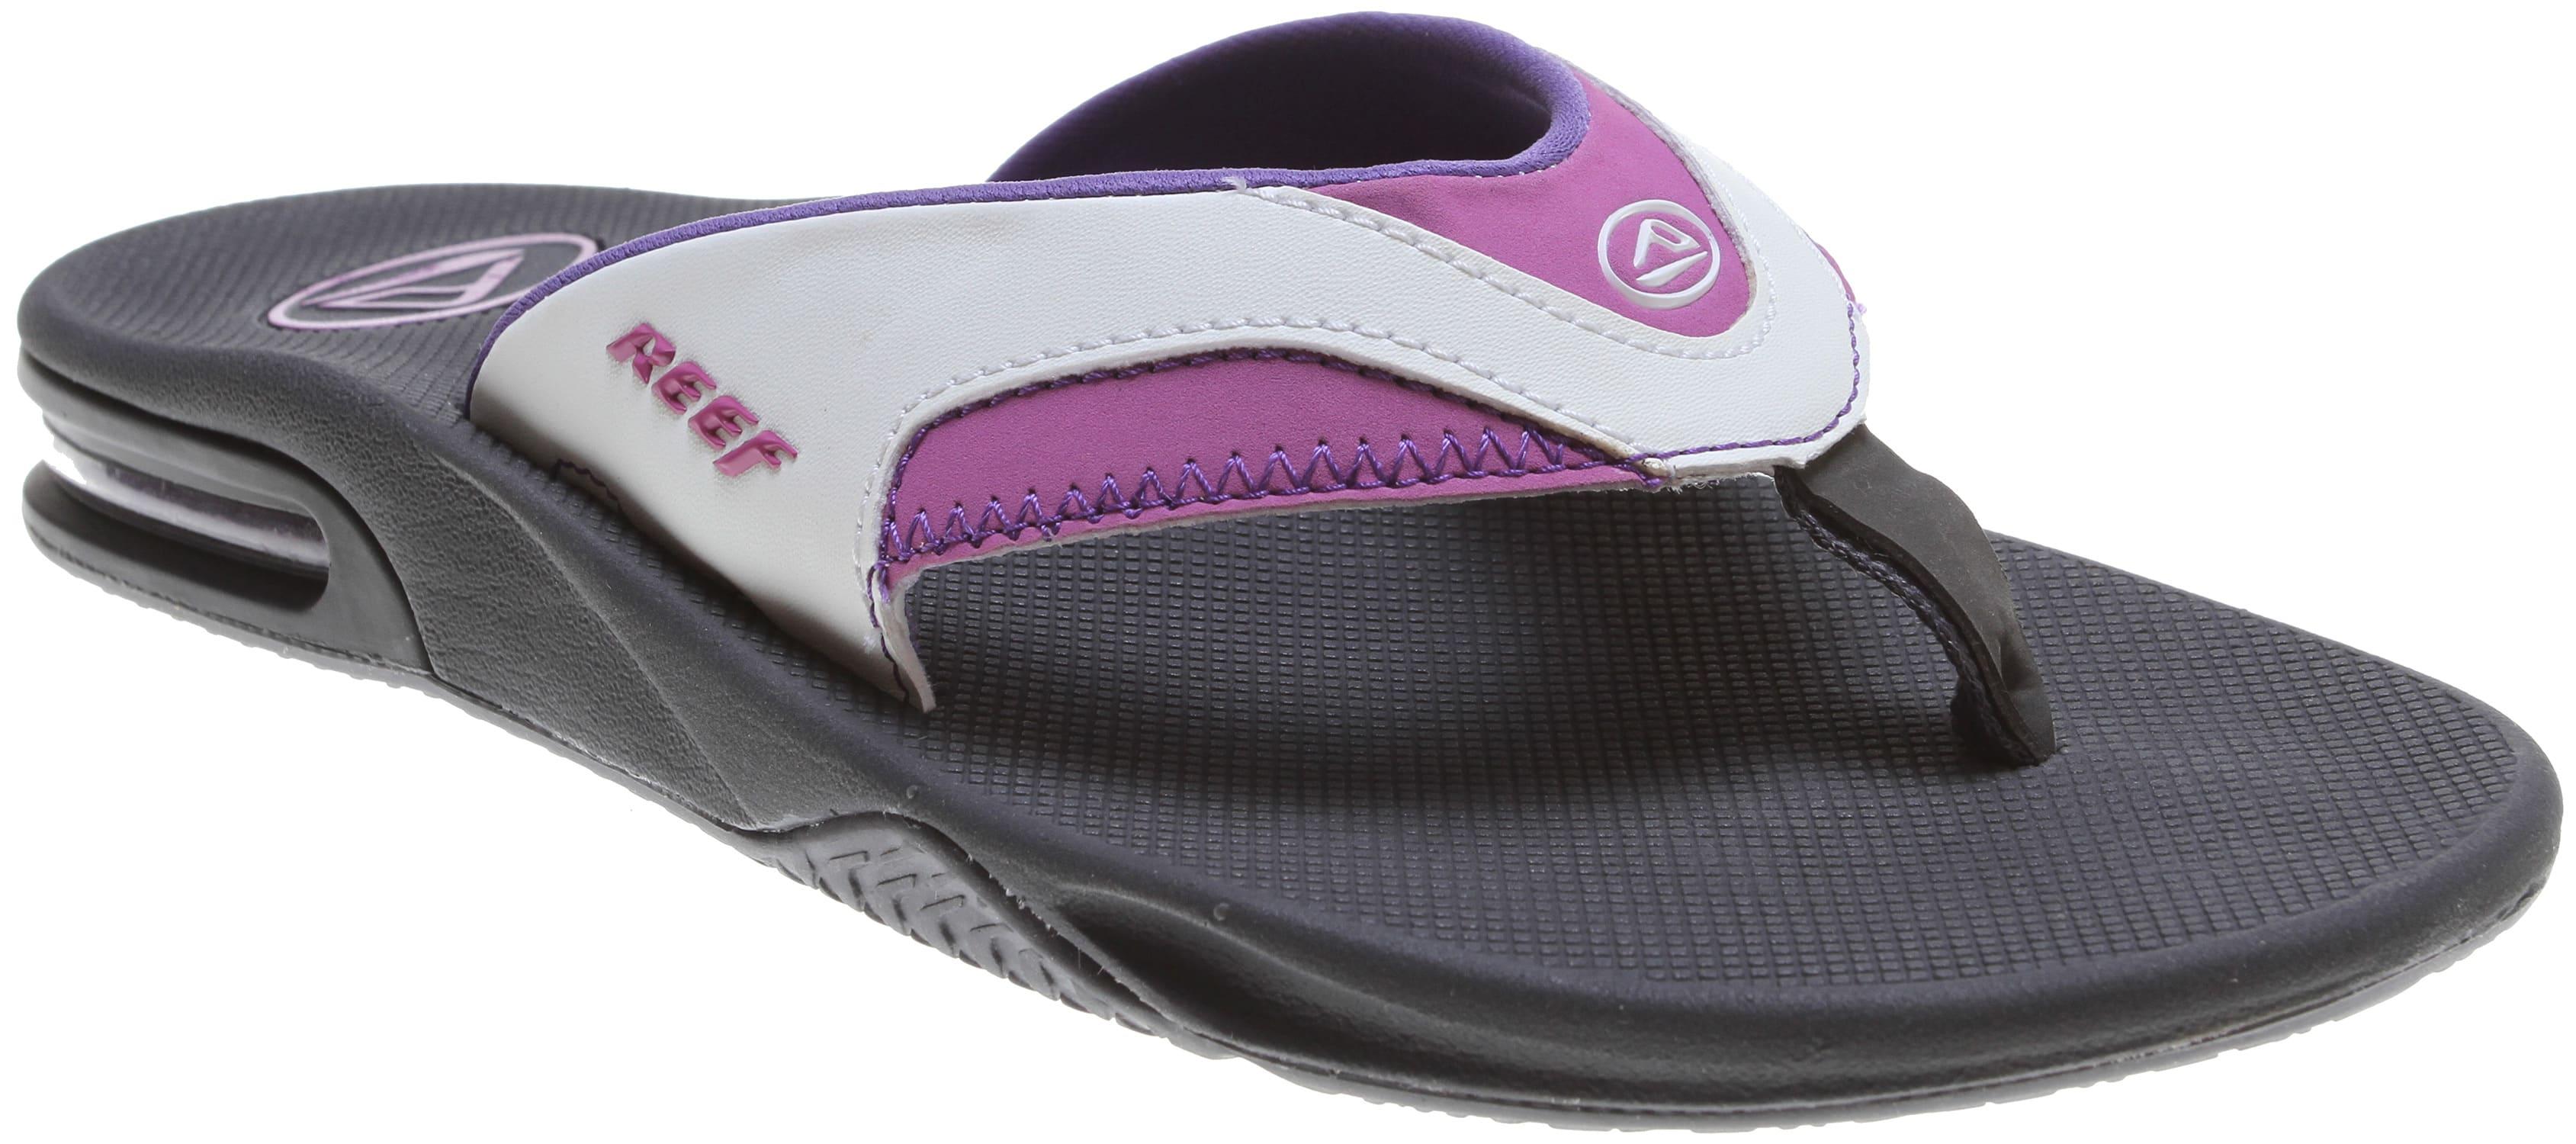 Reef Fanning Sandals - Womens-1010